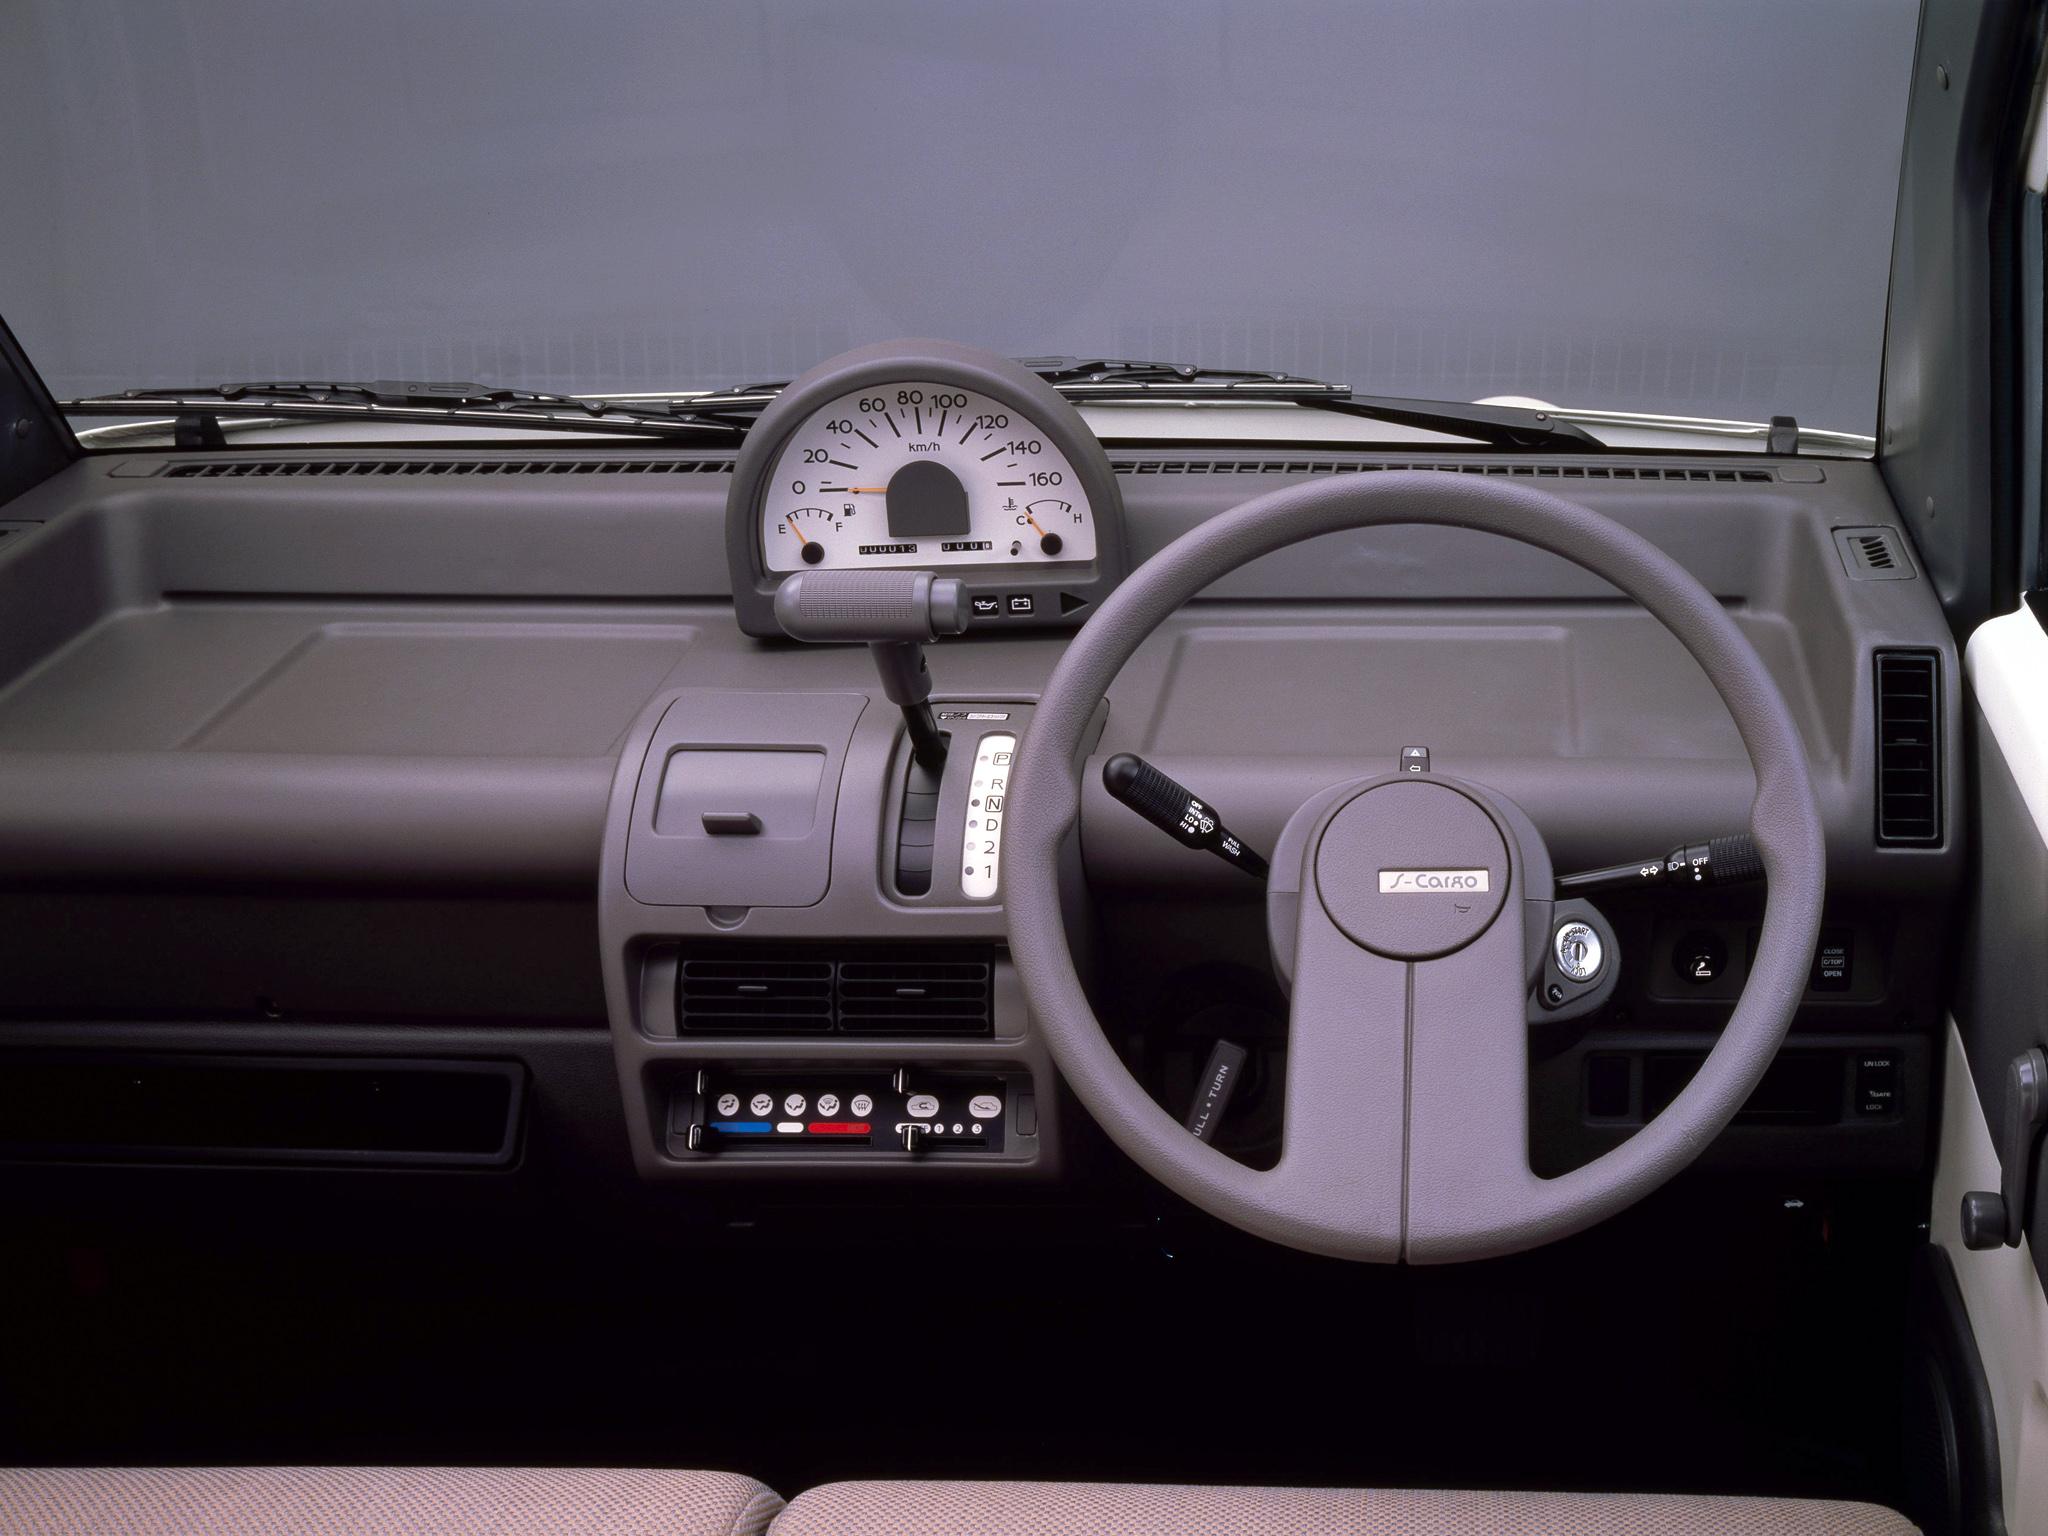 1989 nissan s cargo interior